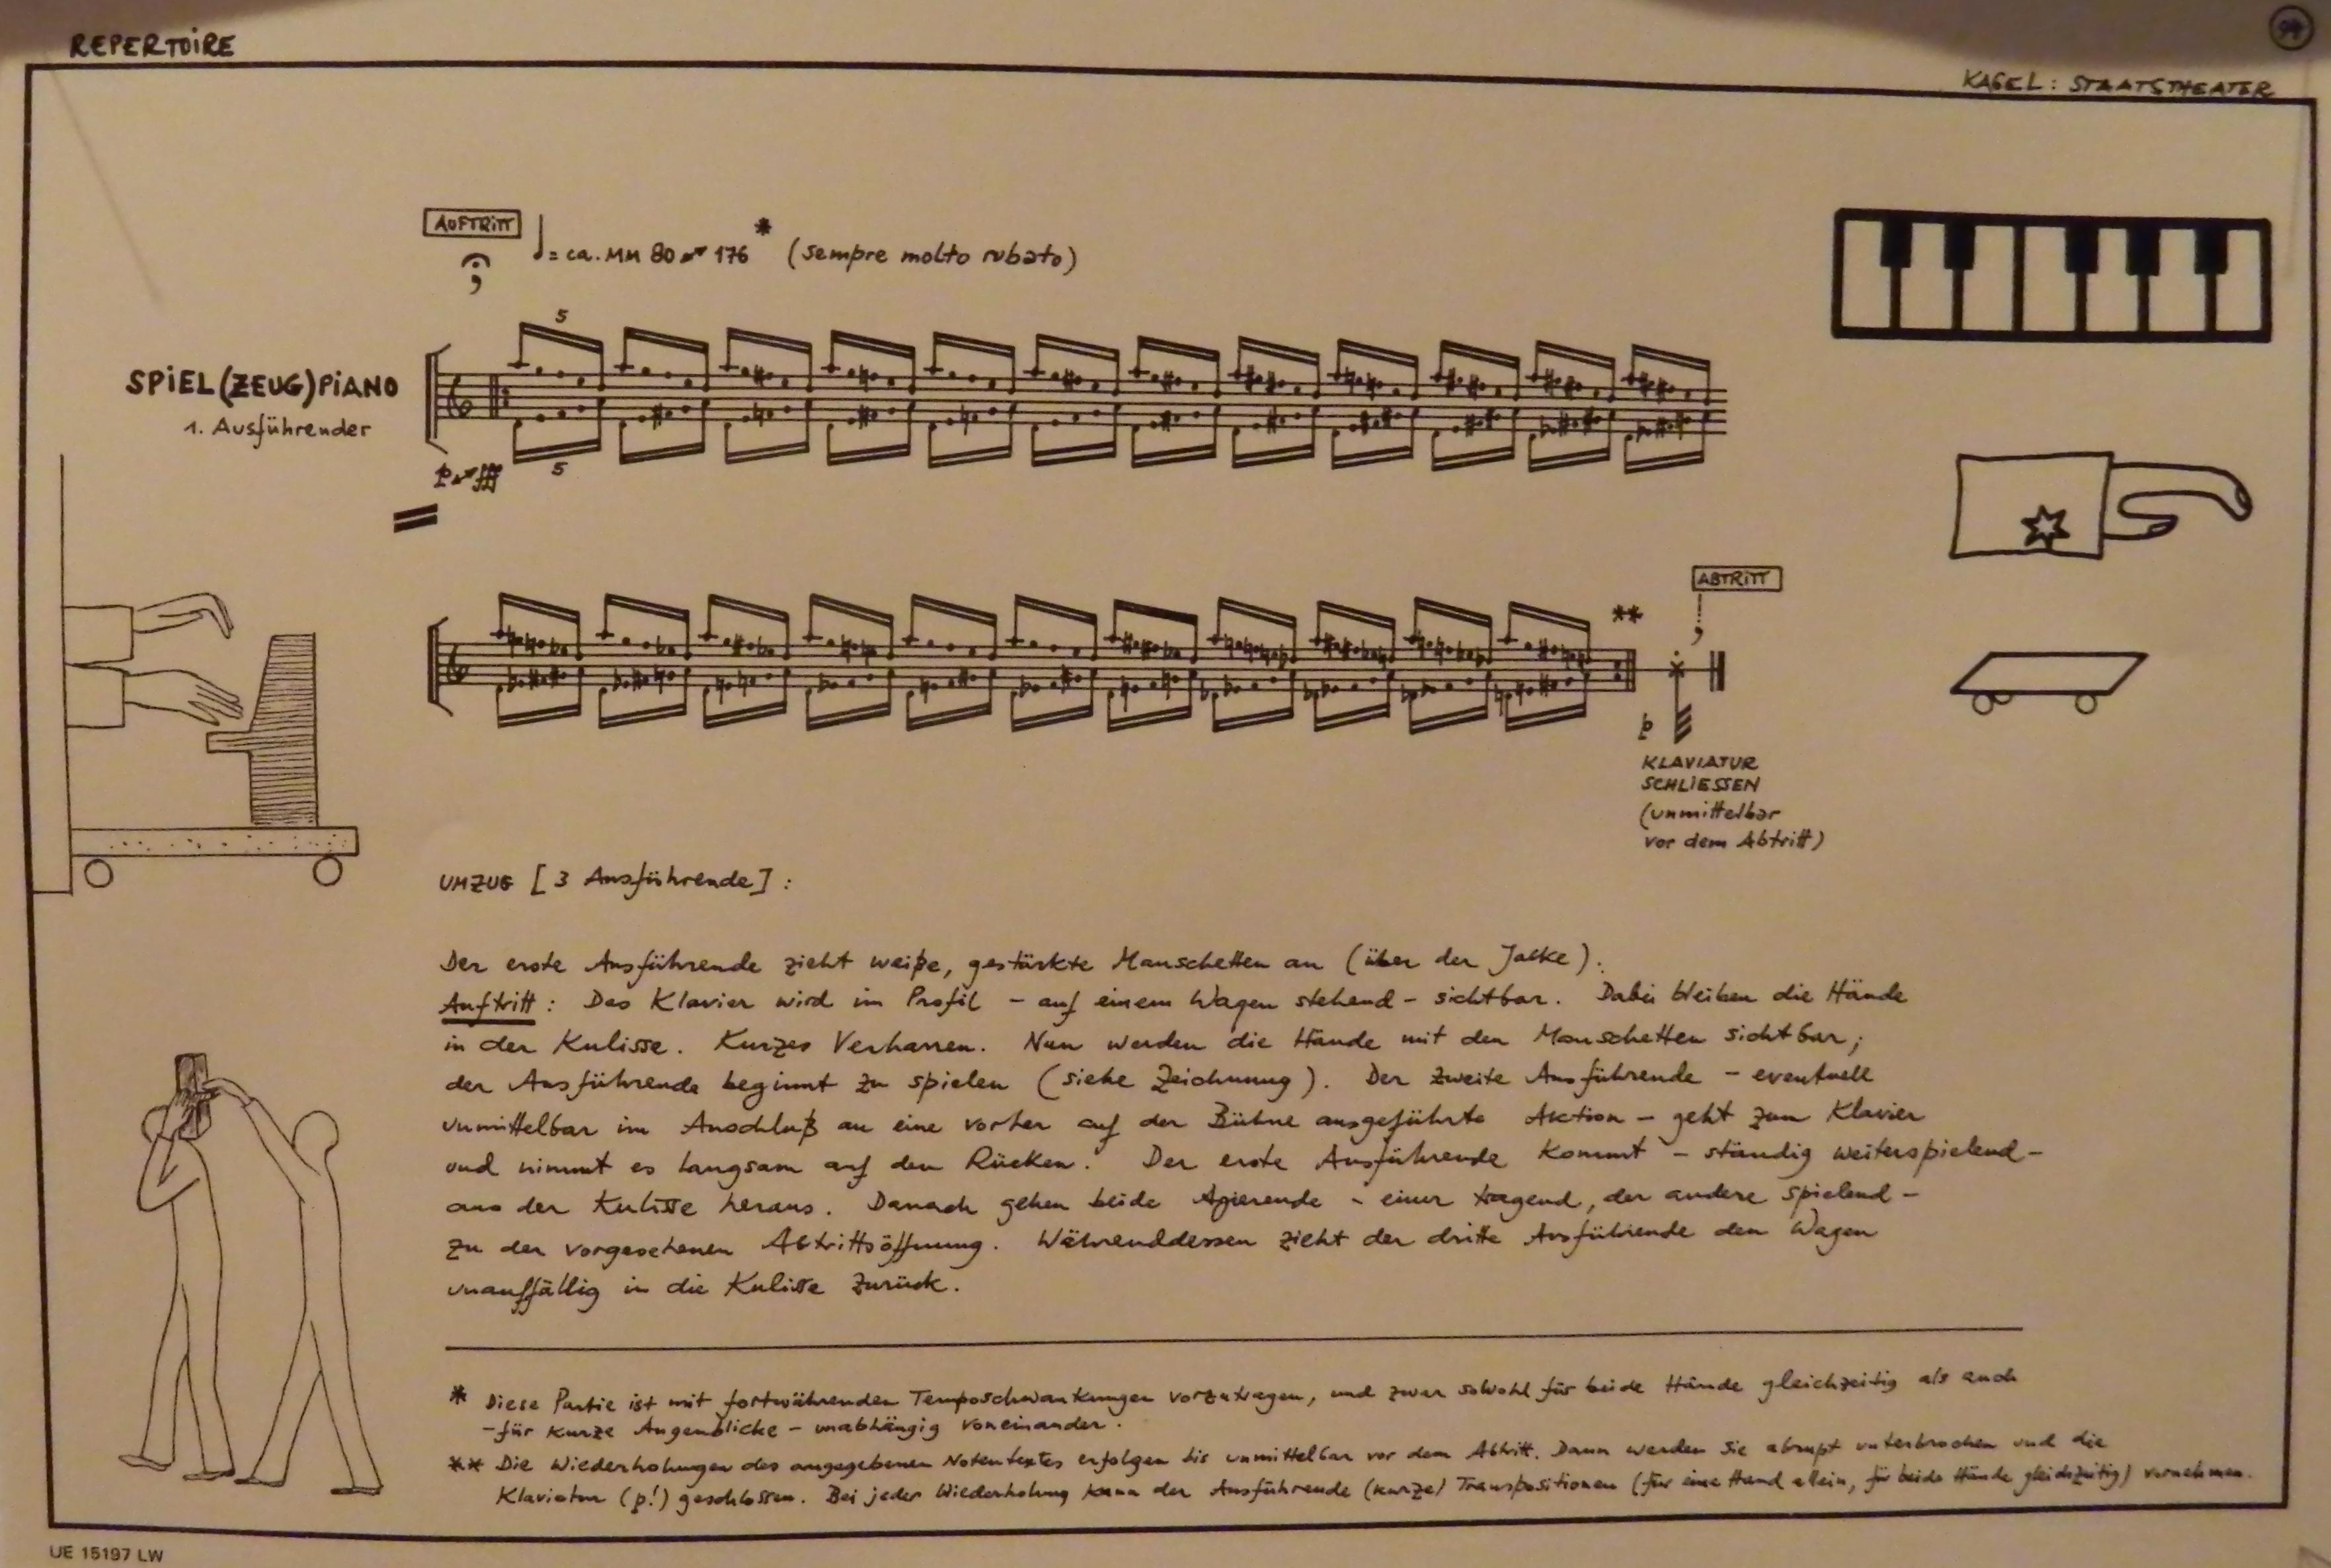 Una de las partituras de Repertoire aus Staatstheater, de Mauricio Kagel